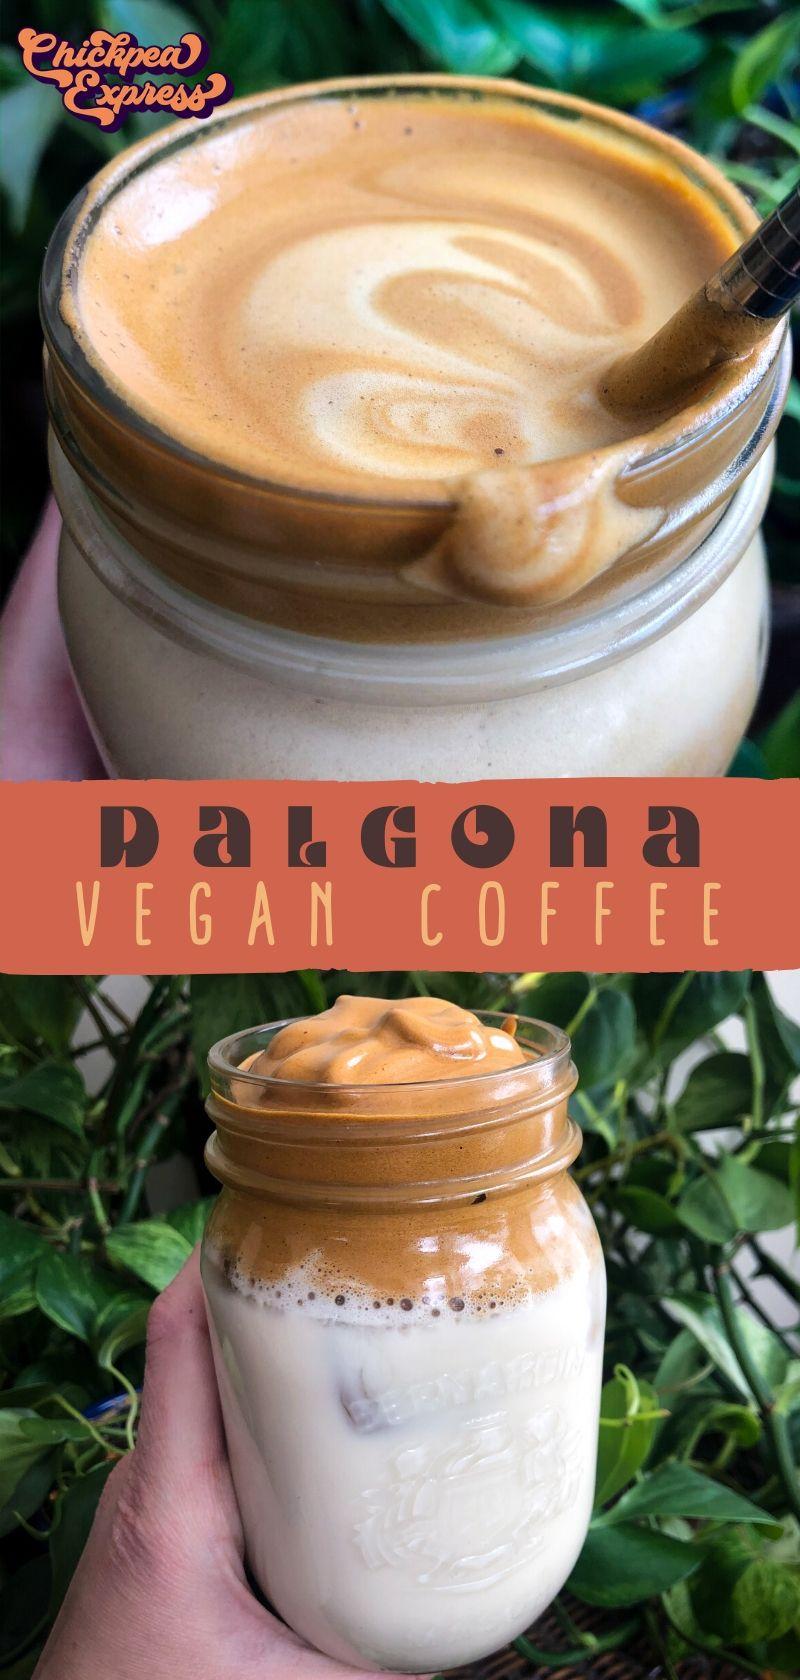 Dalgona Coffee Recipe in 2020 Coffee recipes, Vegan